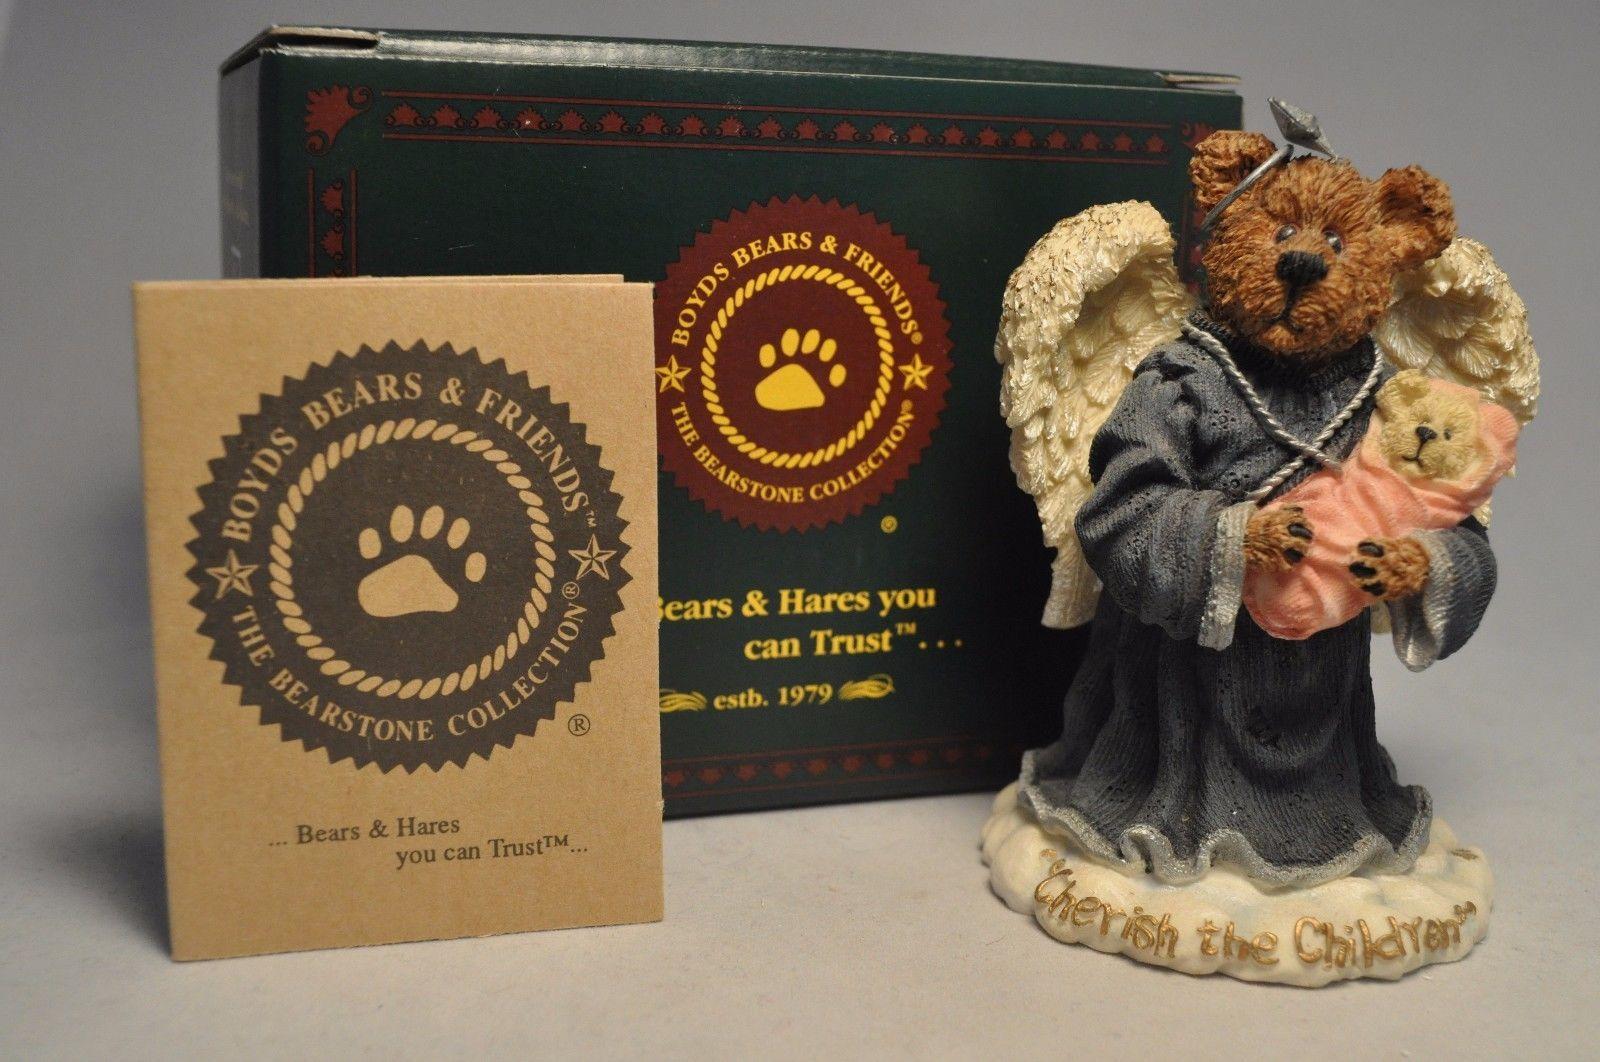 Boyds Bears & Friends: Charity Angelhug & Everychild... 228343 Cherish The Child